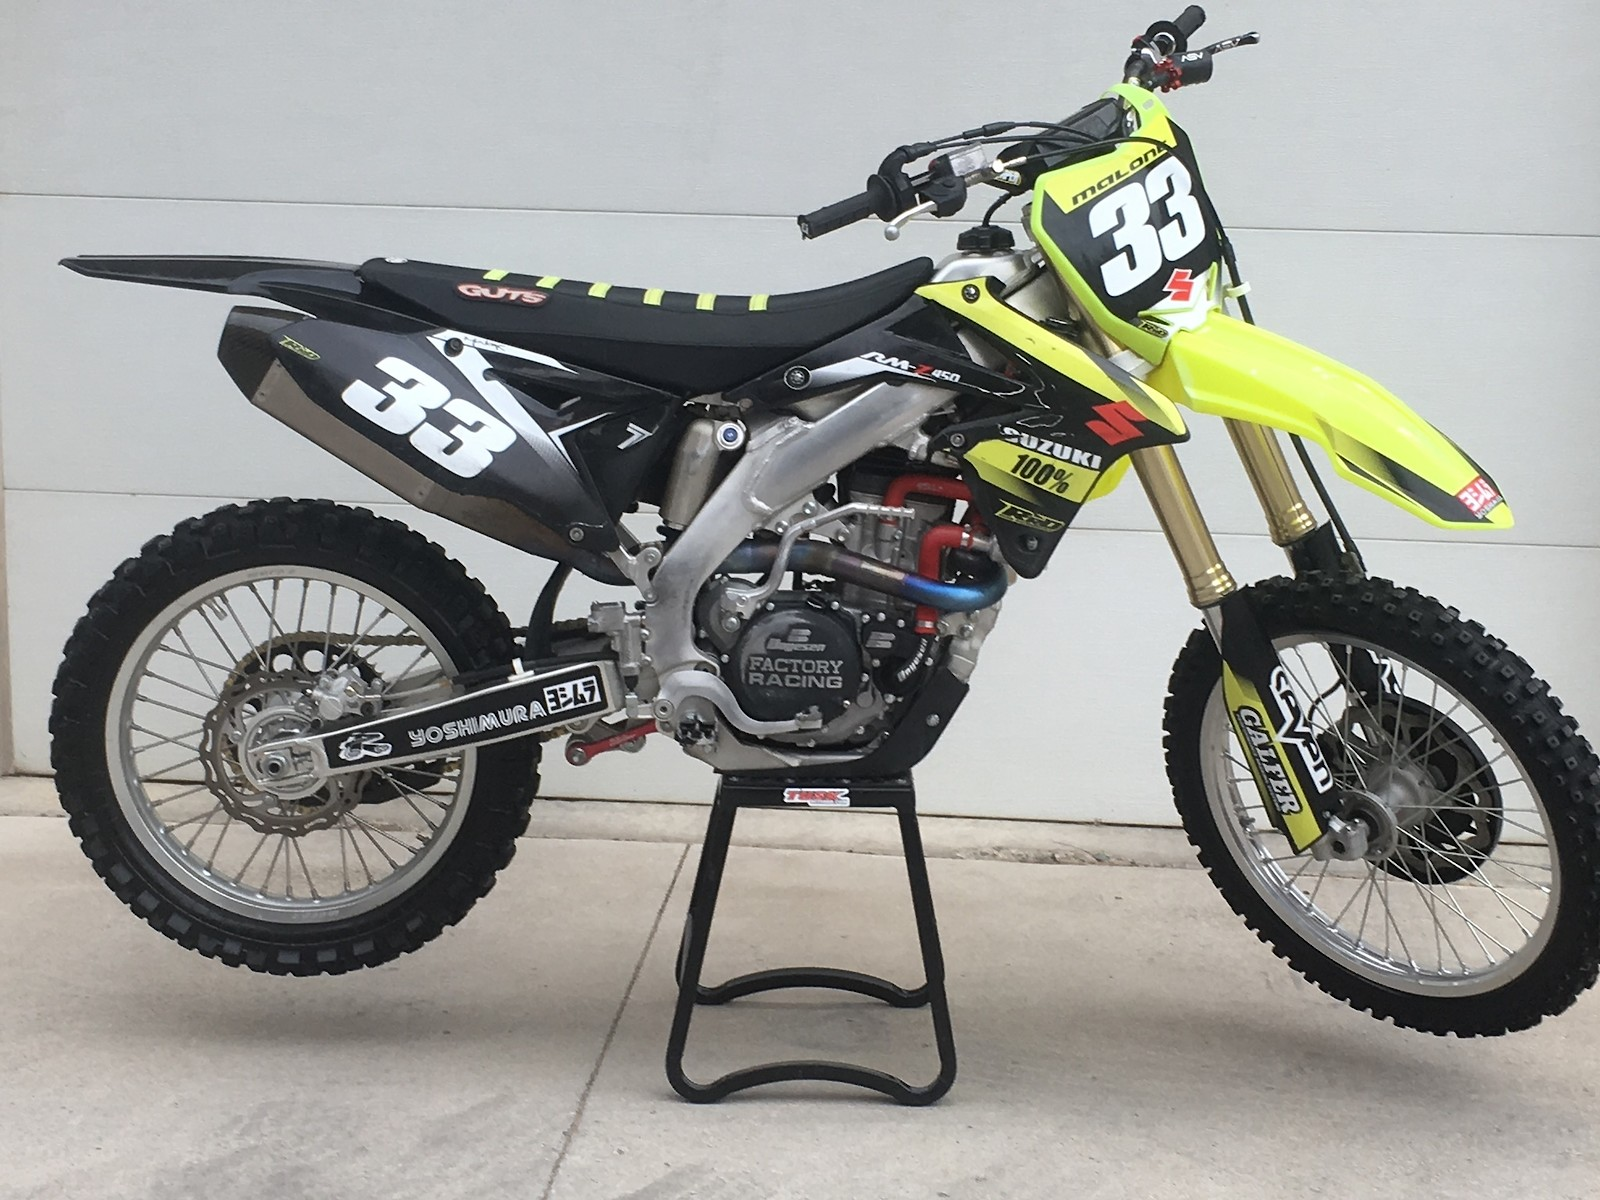 2014 Suzuki RMZ 450